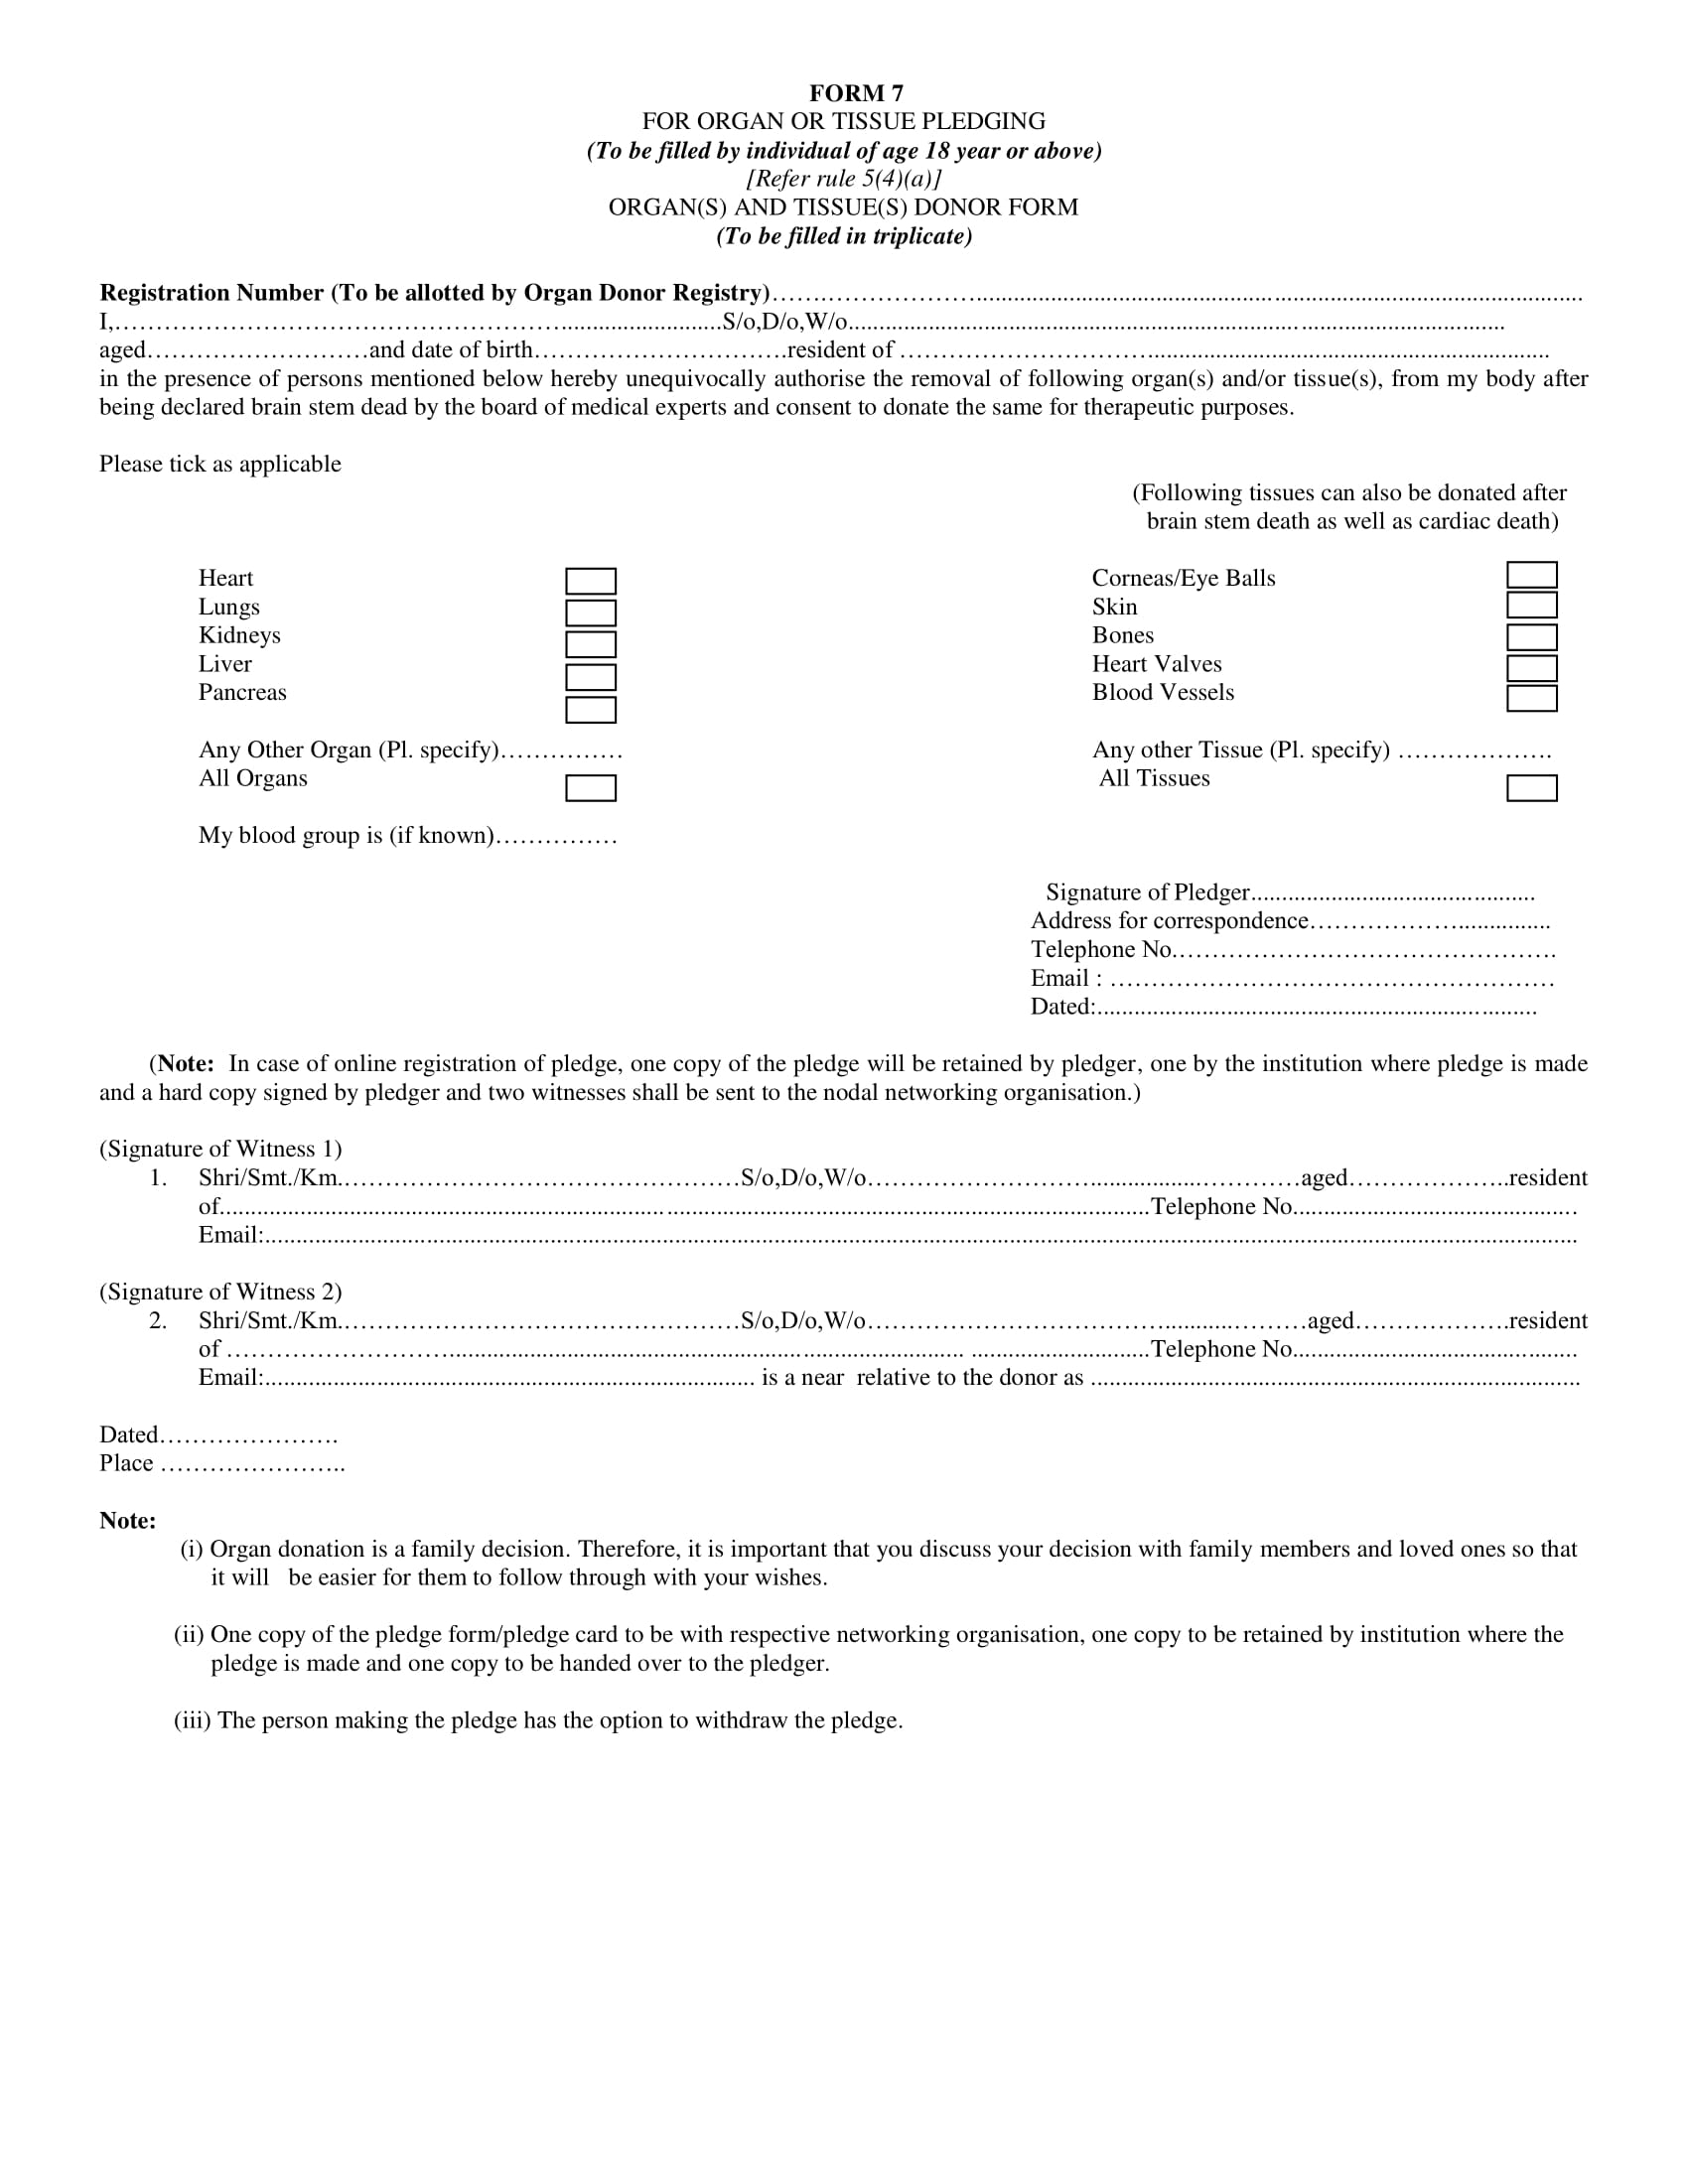 organ tissue pledging donation form 1